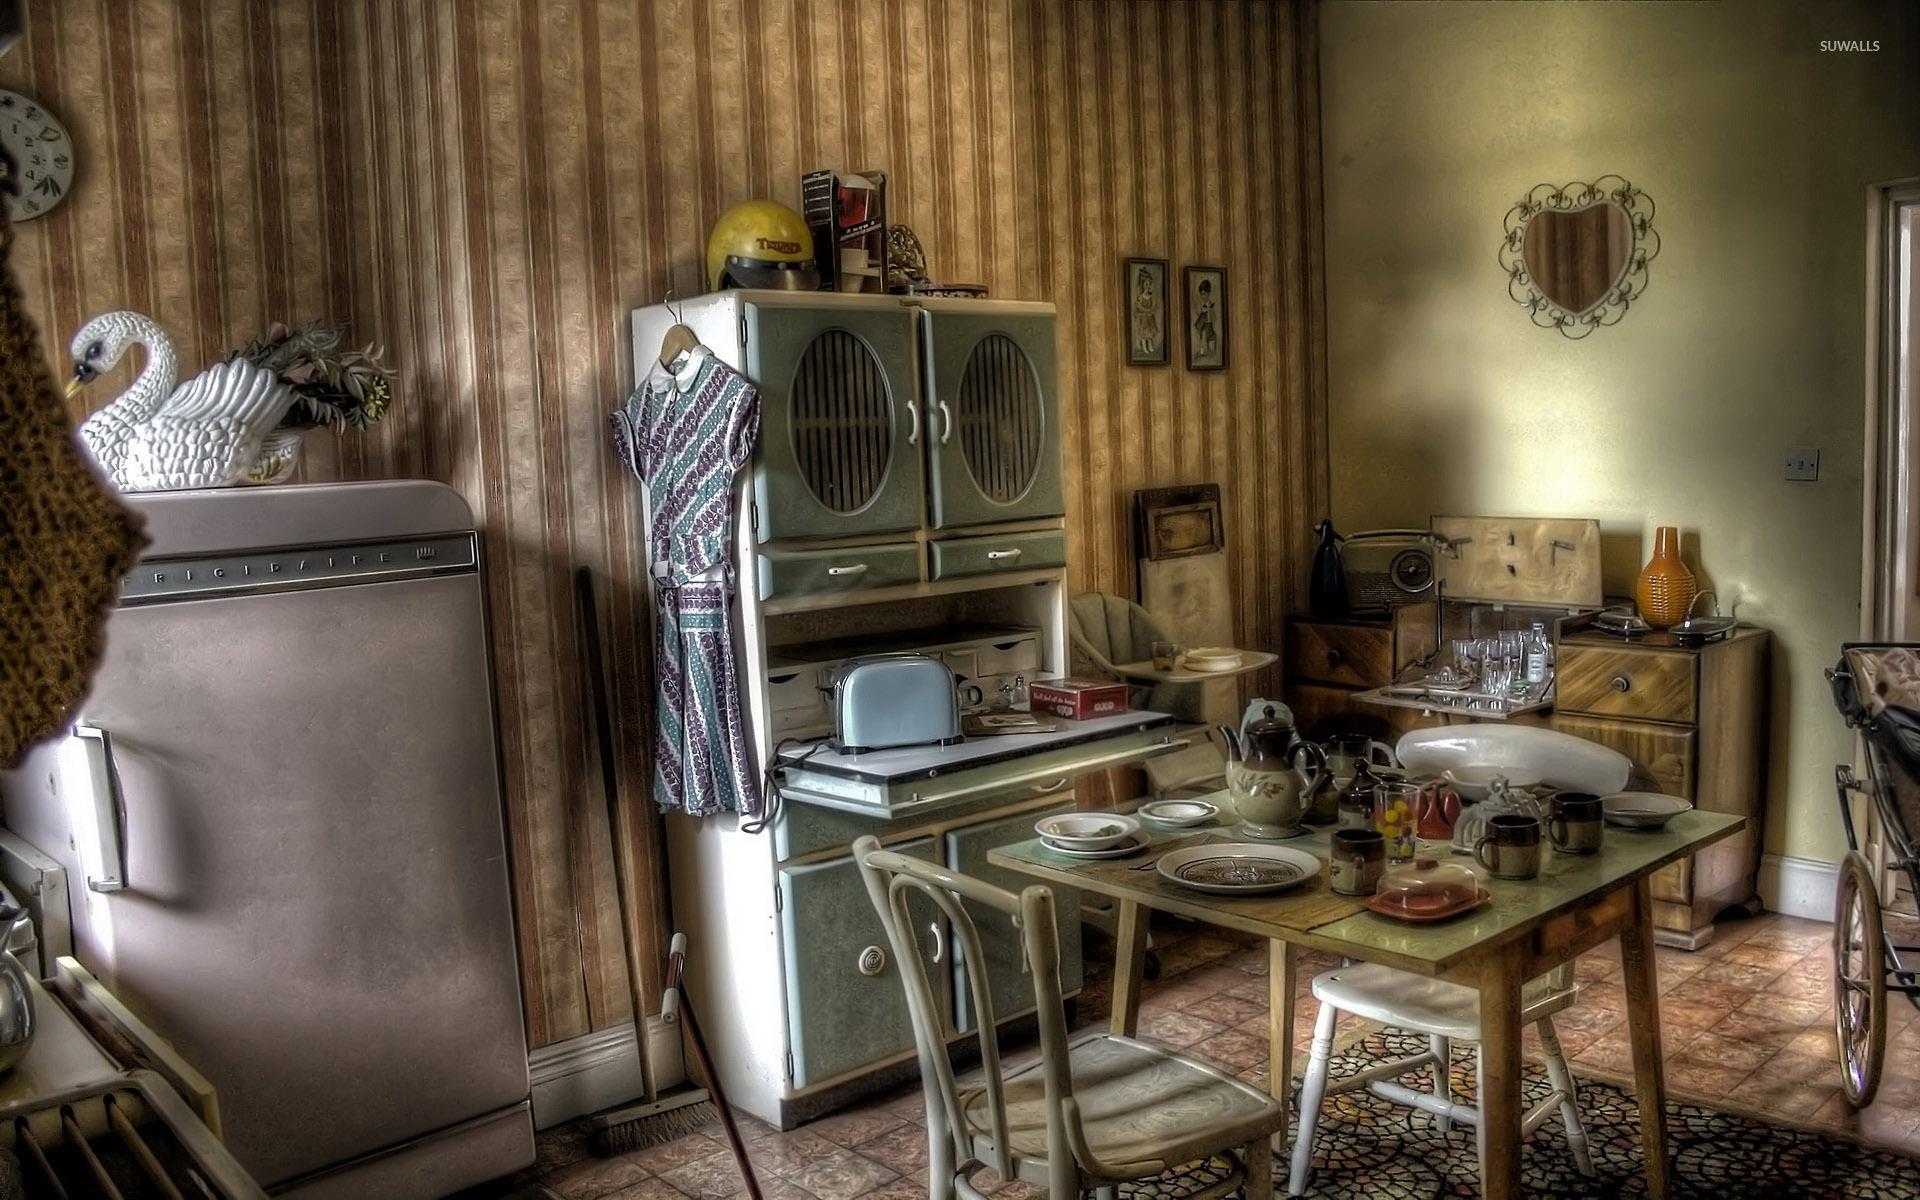 Vintage Kitchen Background ~ Vintage kitchen wallpaper photography wallpapers